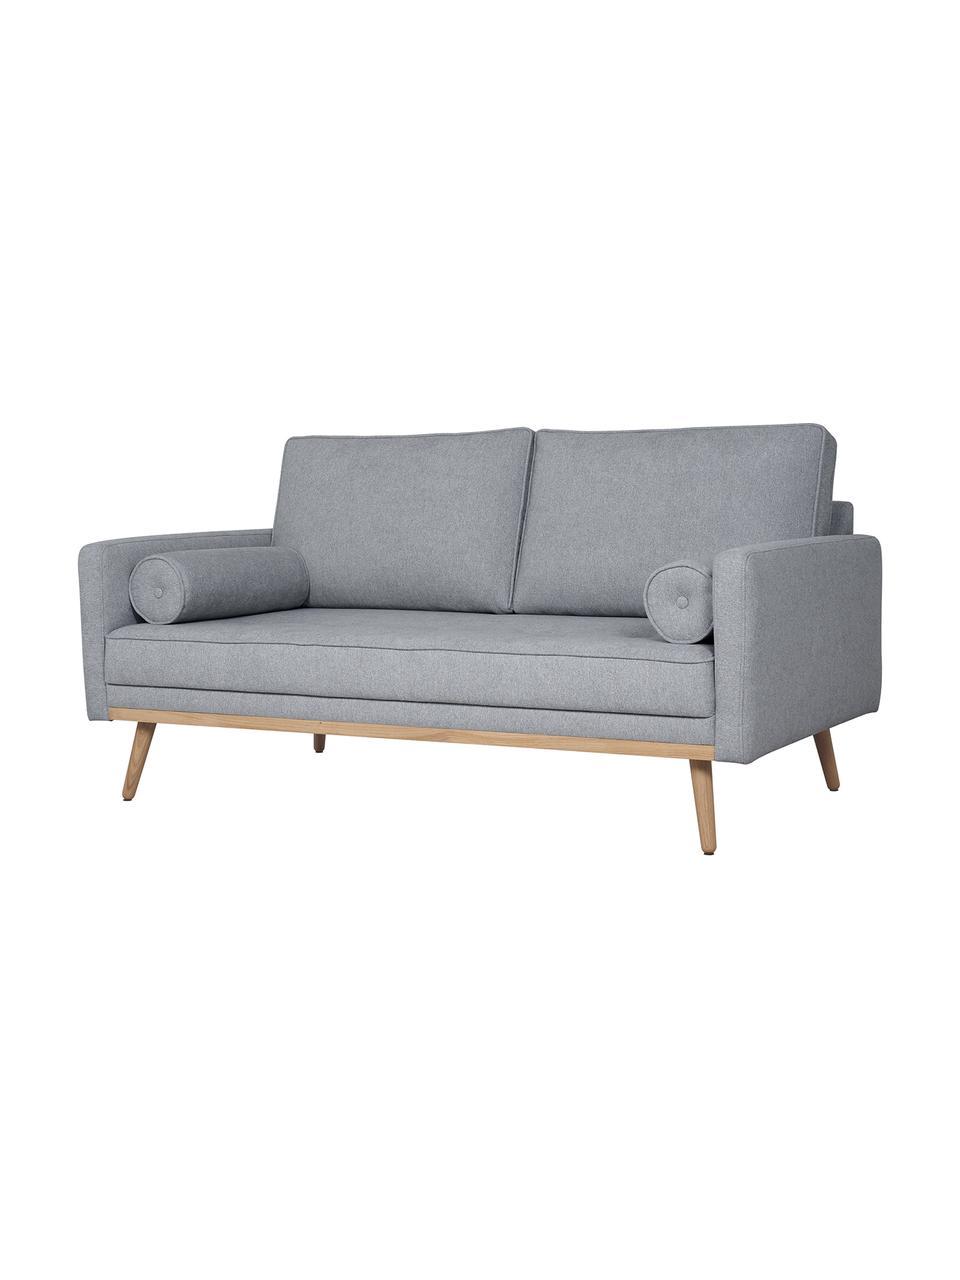 Sofa Saint (2-Sitzer) in Blaugrau mit Eichenholz-Füßen, Bezug: Polyester Der hochwertige, Gestell: Massives Kiefernholz, Spa, Webstoff Blaugrau, B 169 x T 87 cm